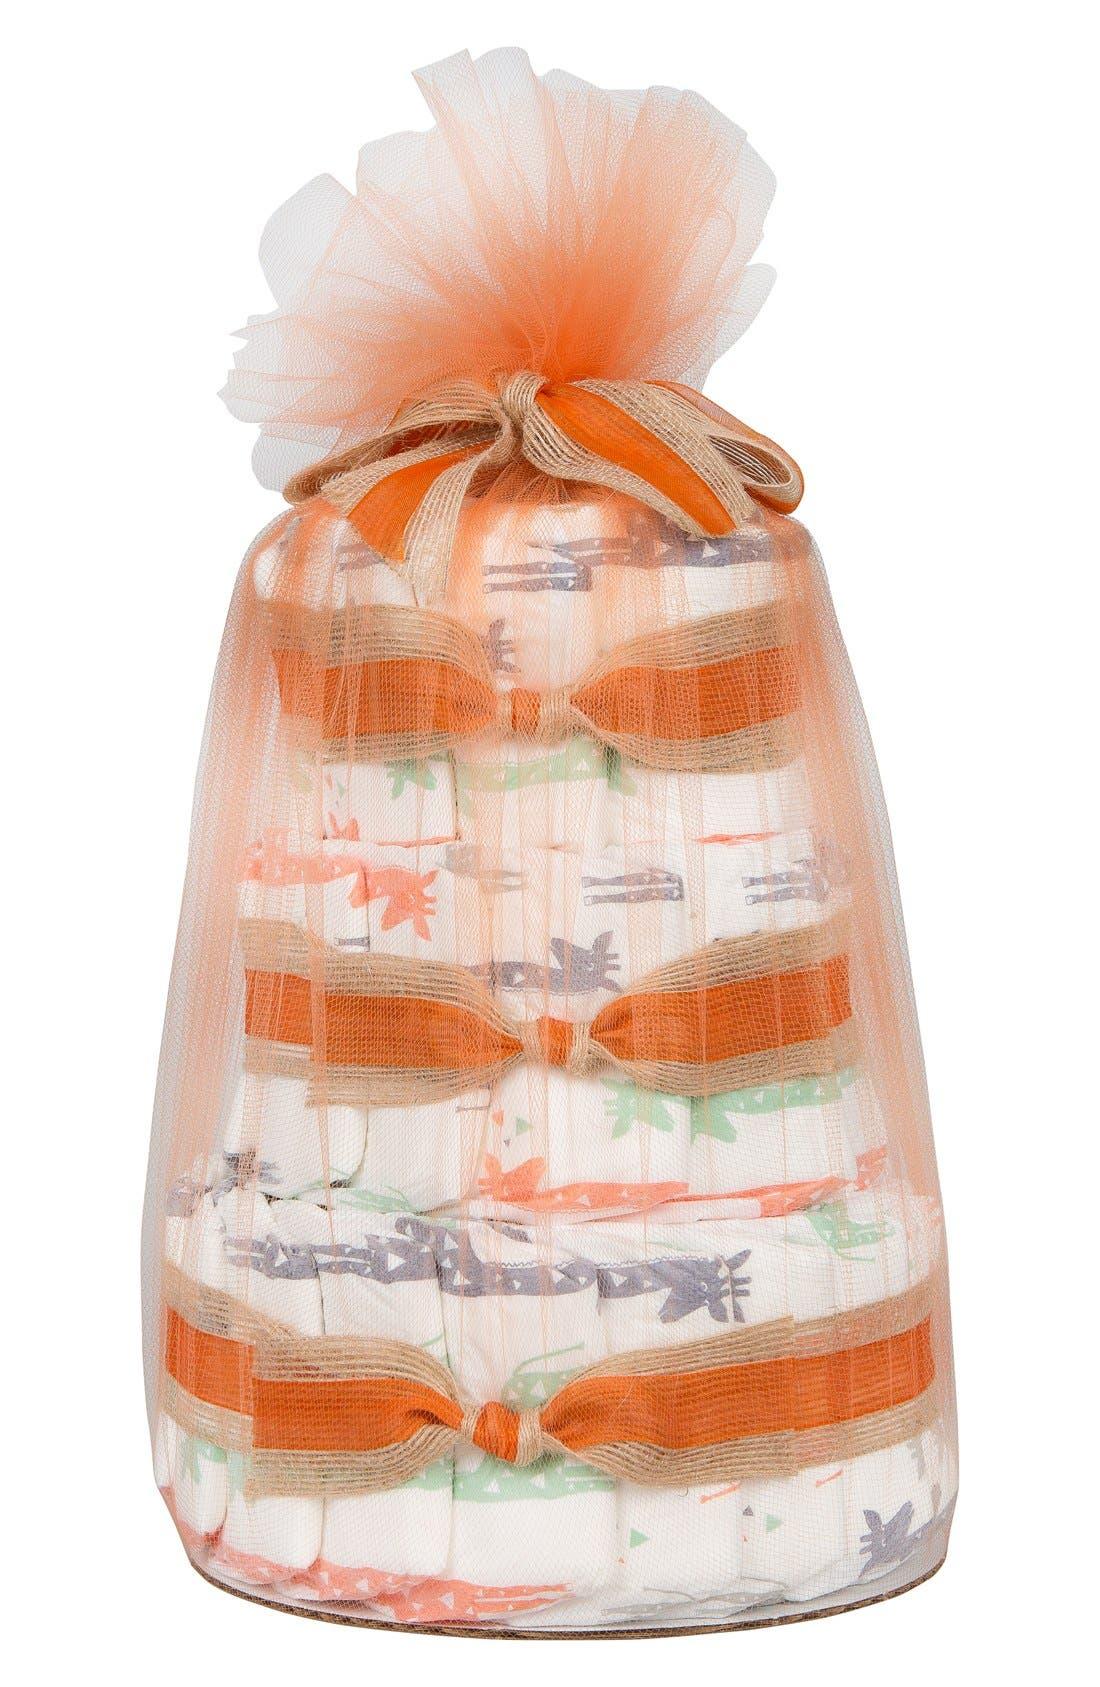 Mini Diaper Cake & Travel-Size Essentials Set, Main, color, 800